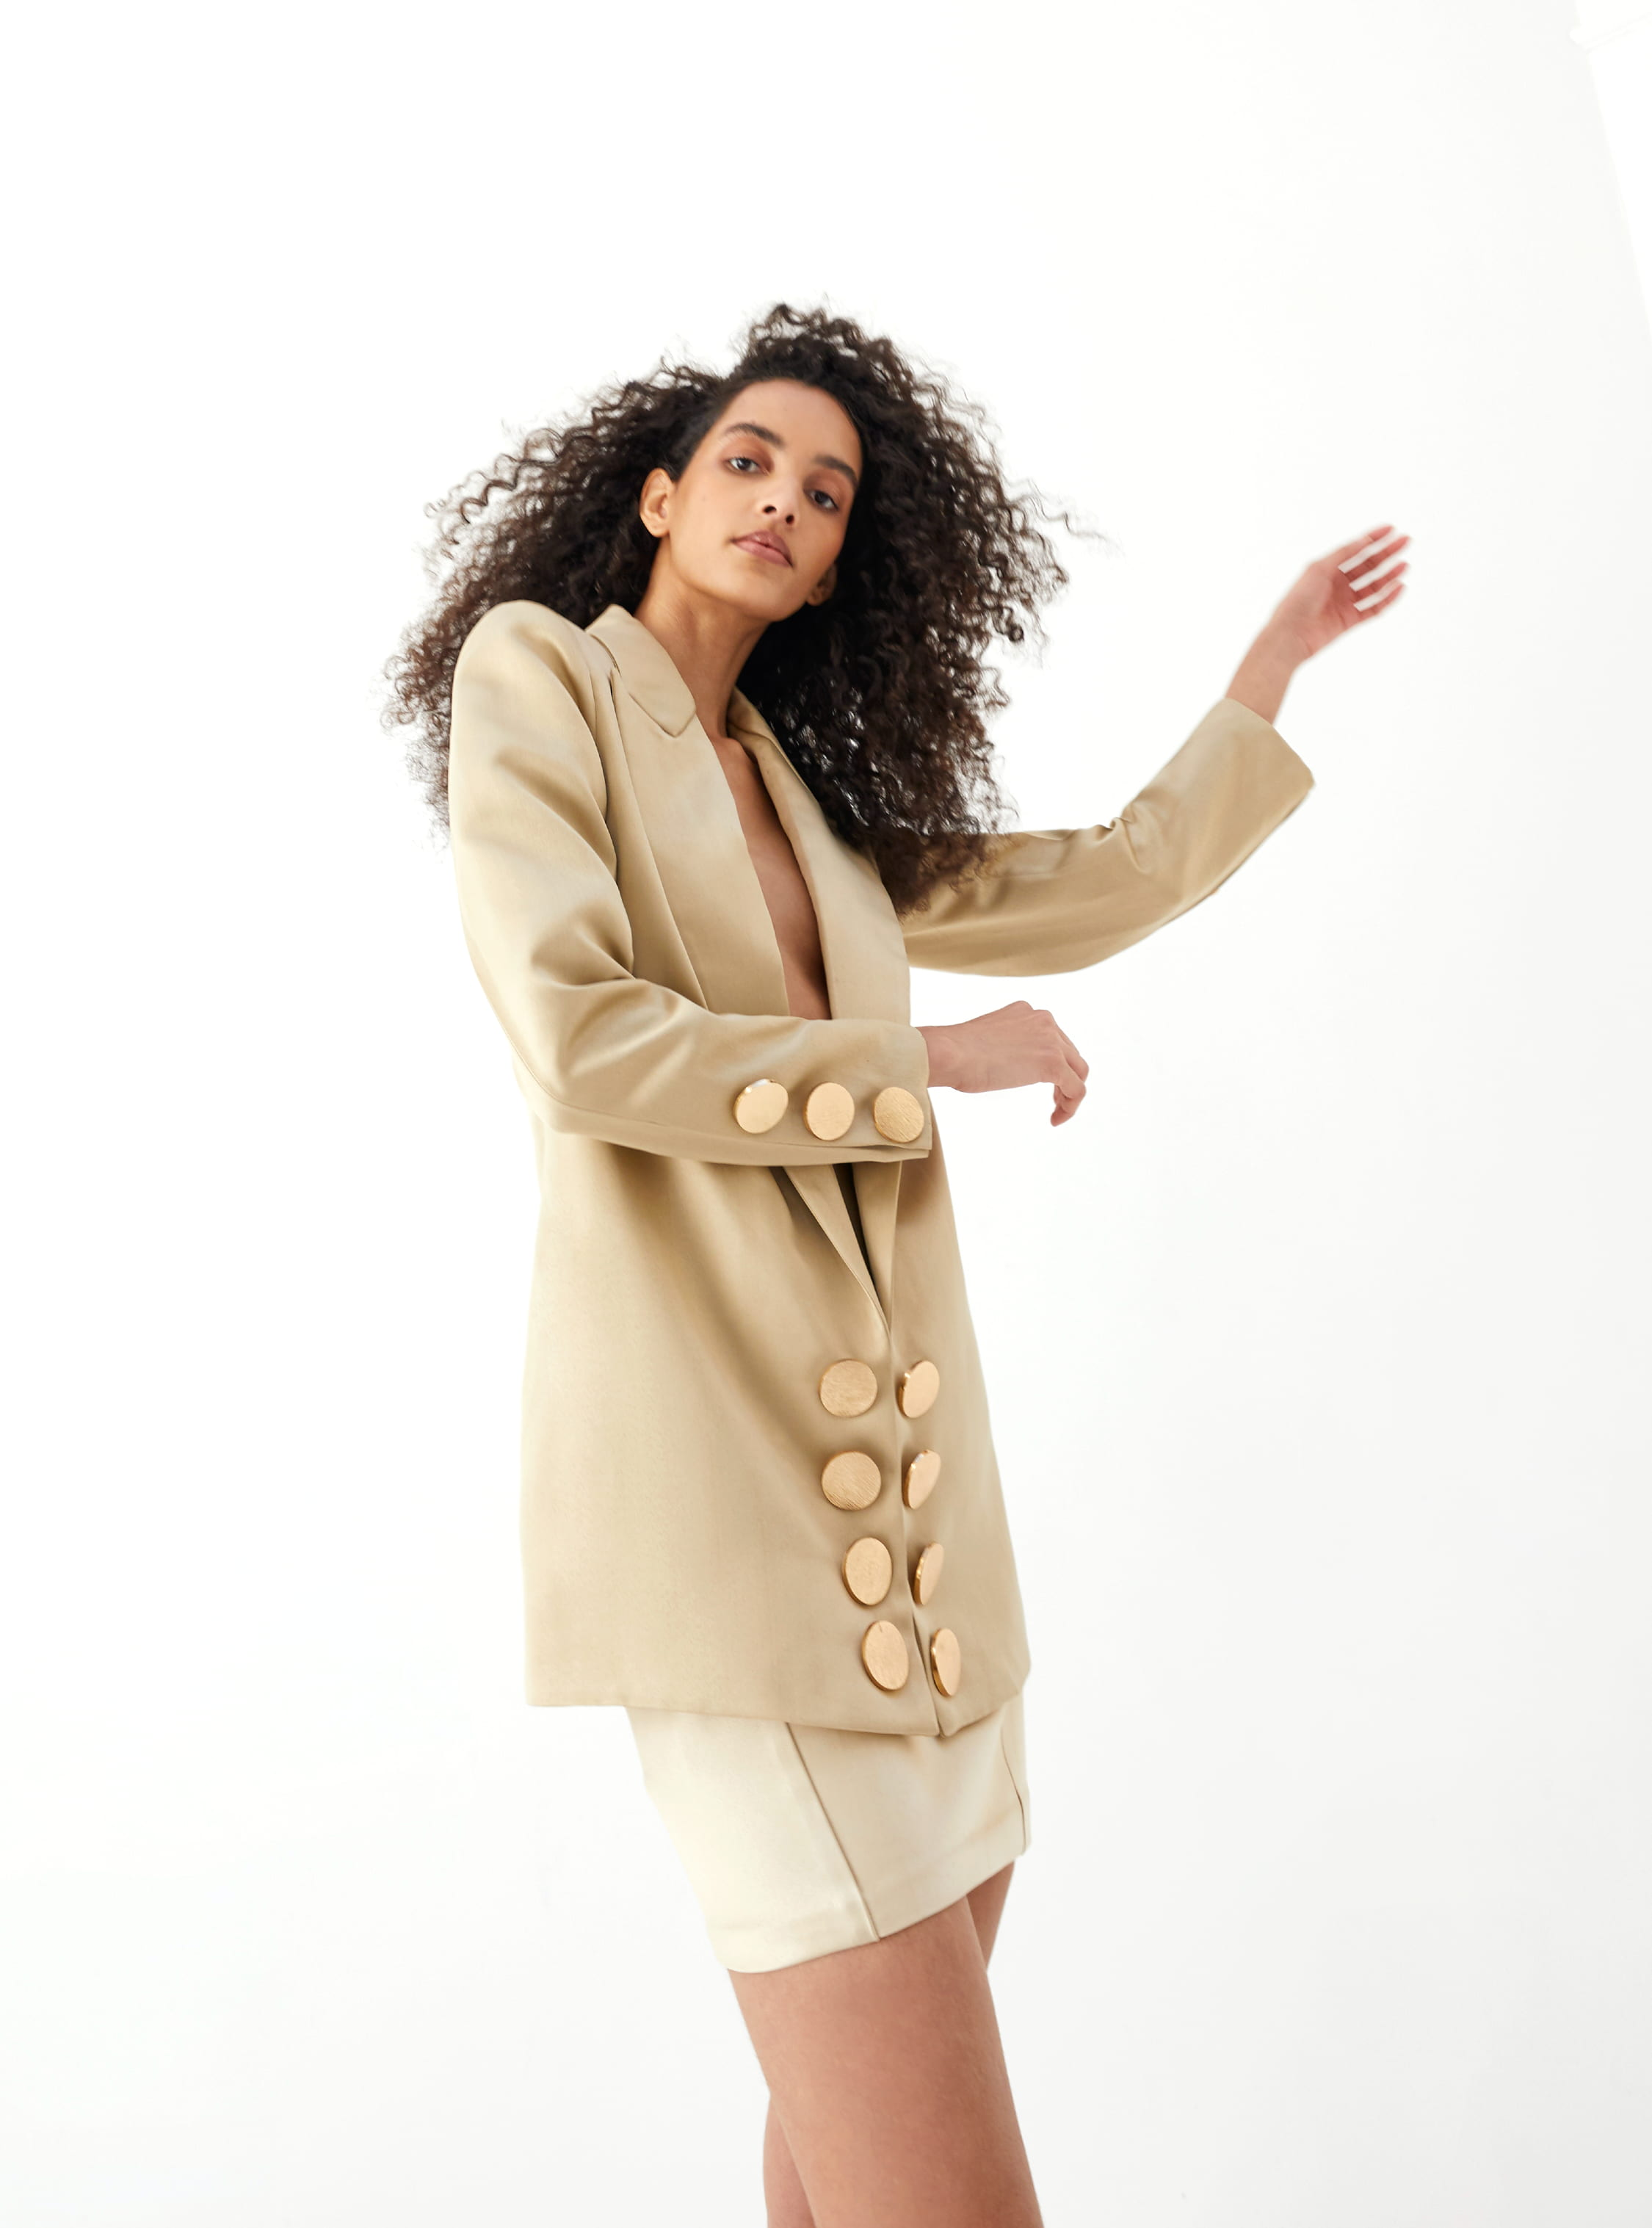 View 3 of model wearing Kalisa Blazer in sand gold.